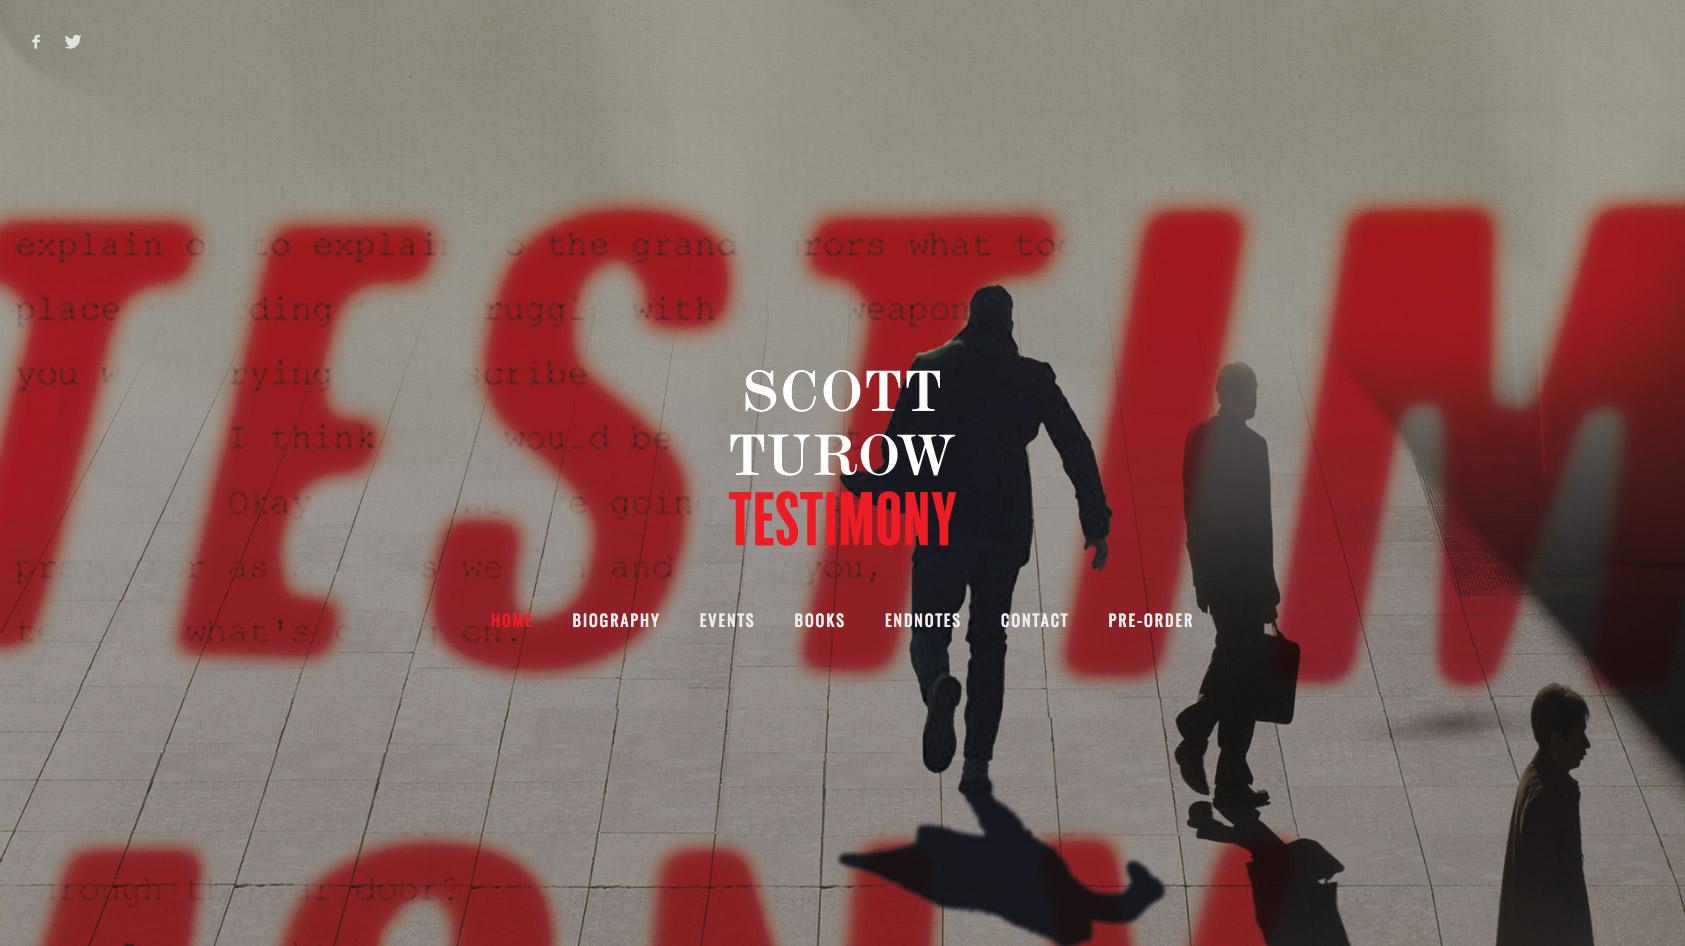 scottturow_com